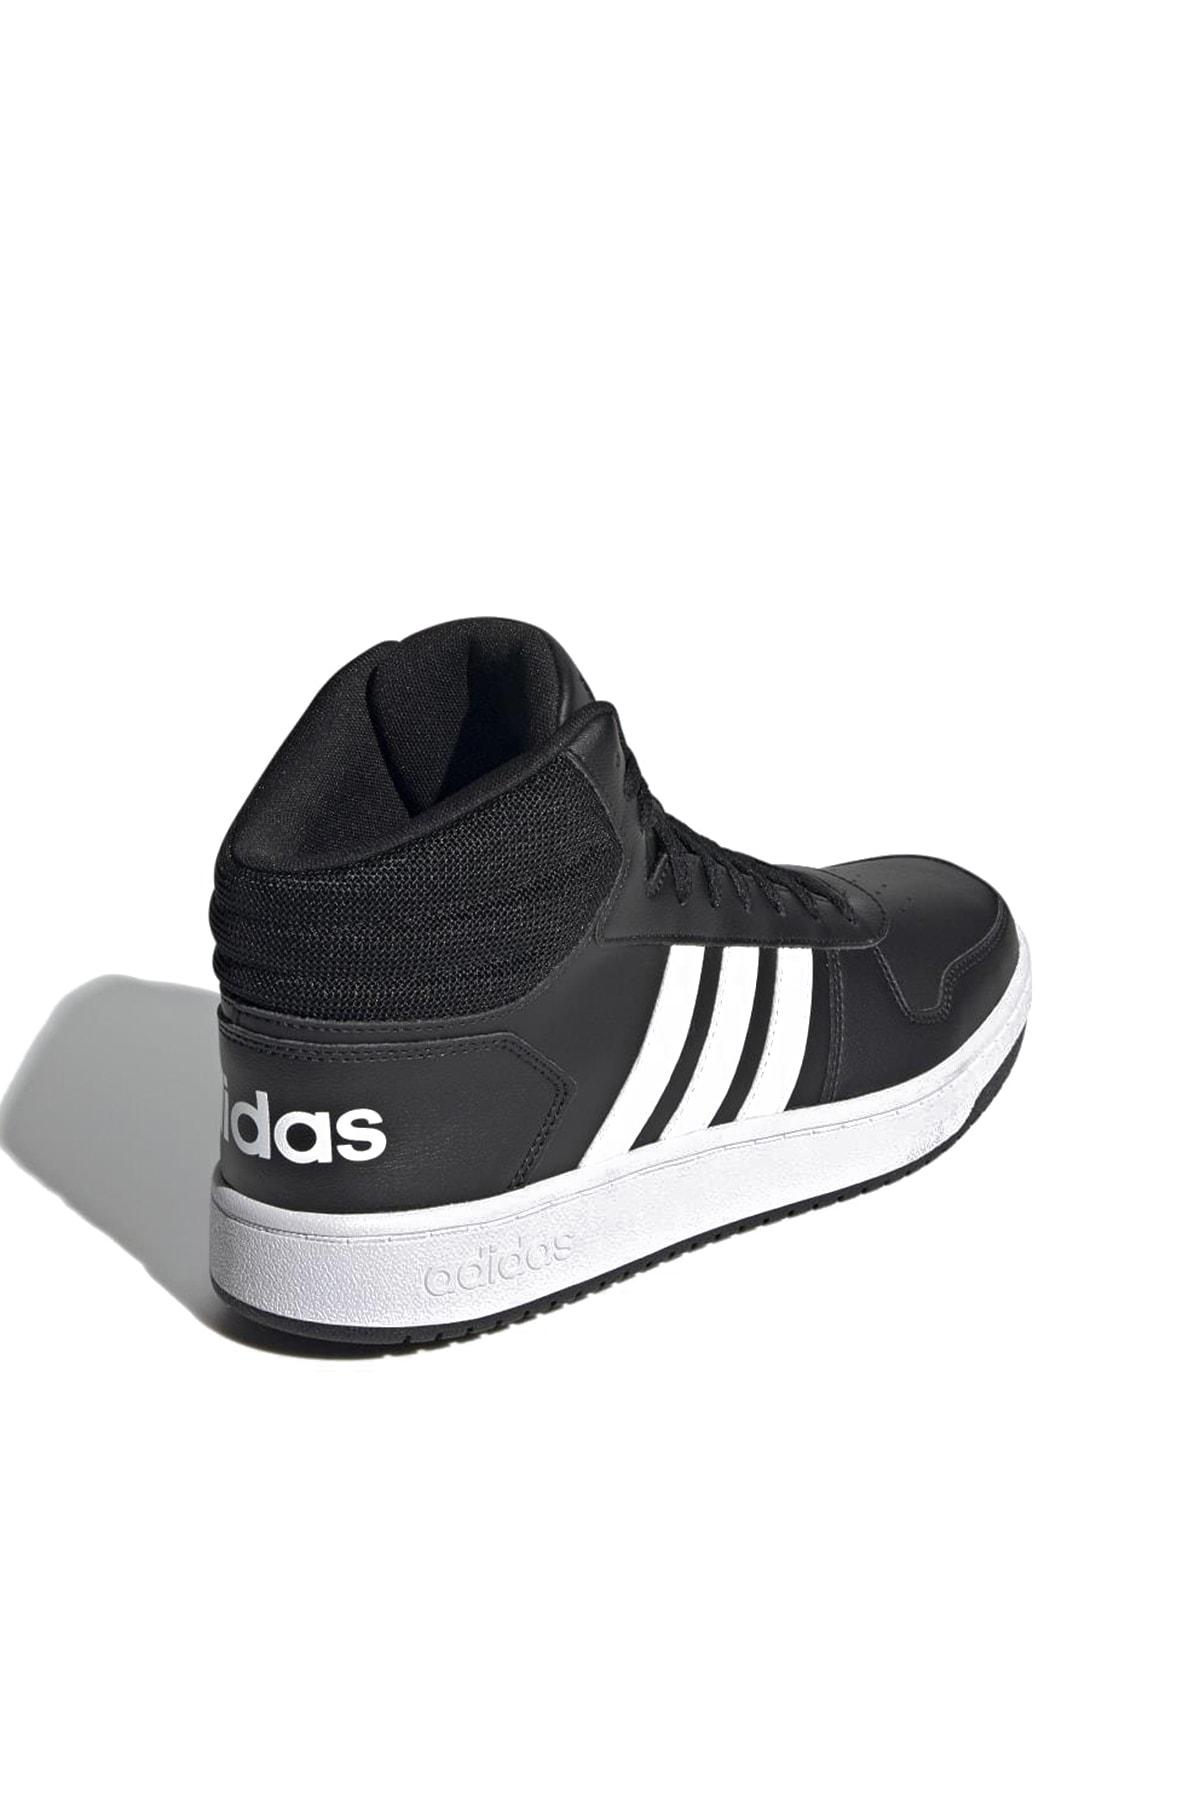 adidas Unisex Sneaker HOOPS 2.0 MID GÜNLÜK SPOR AYAKKABI 1